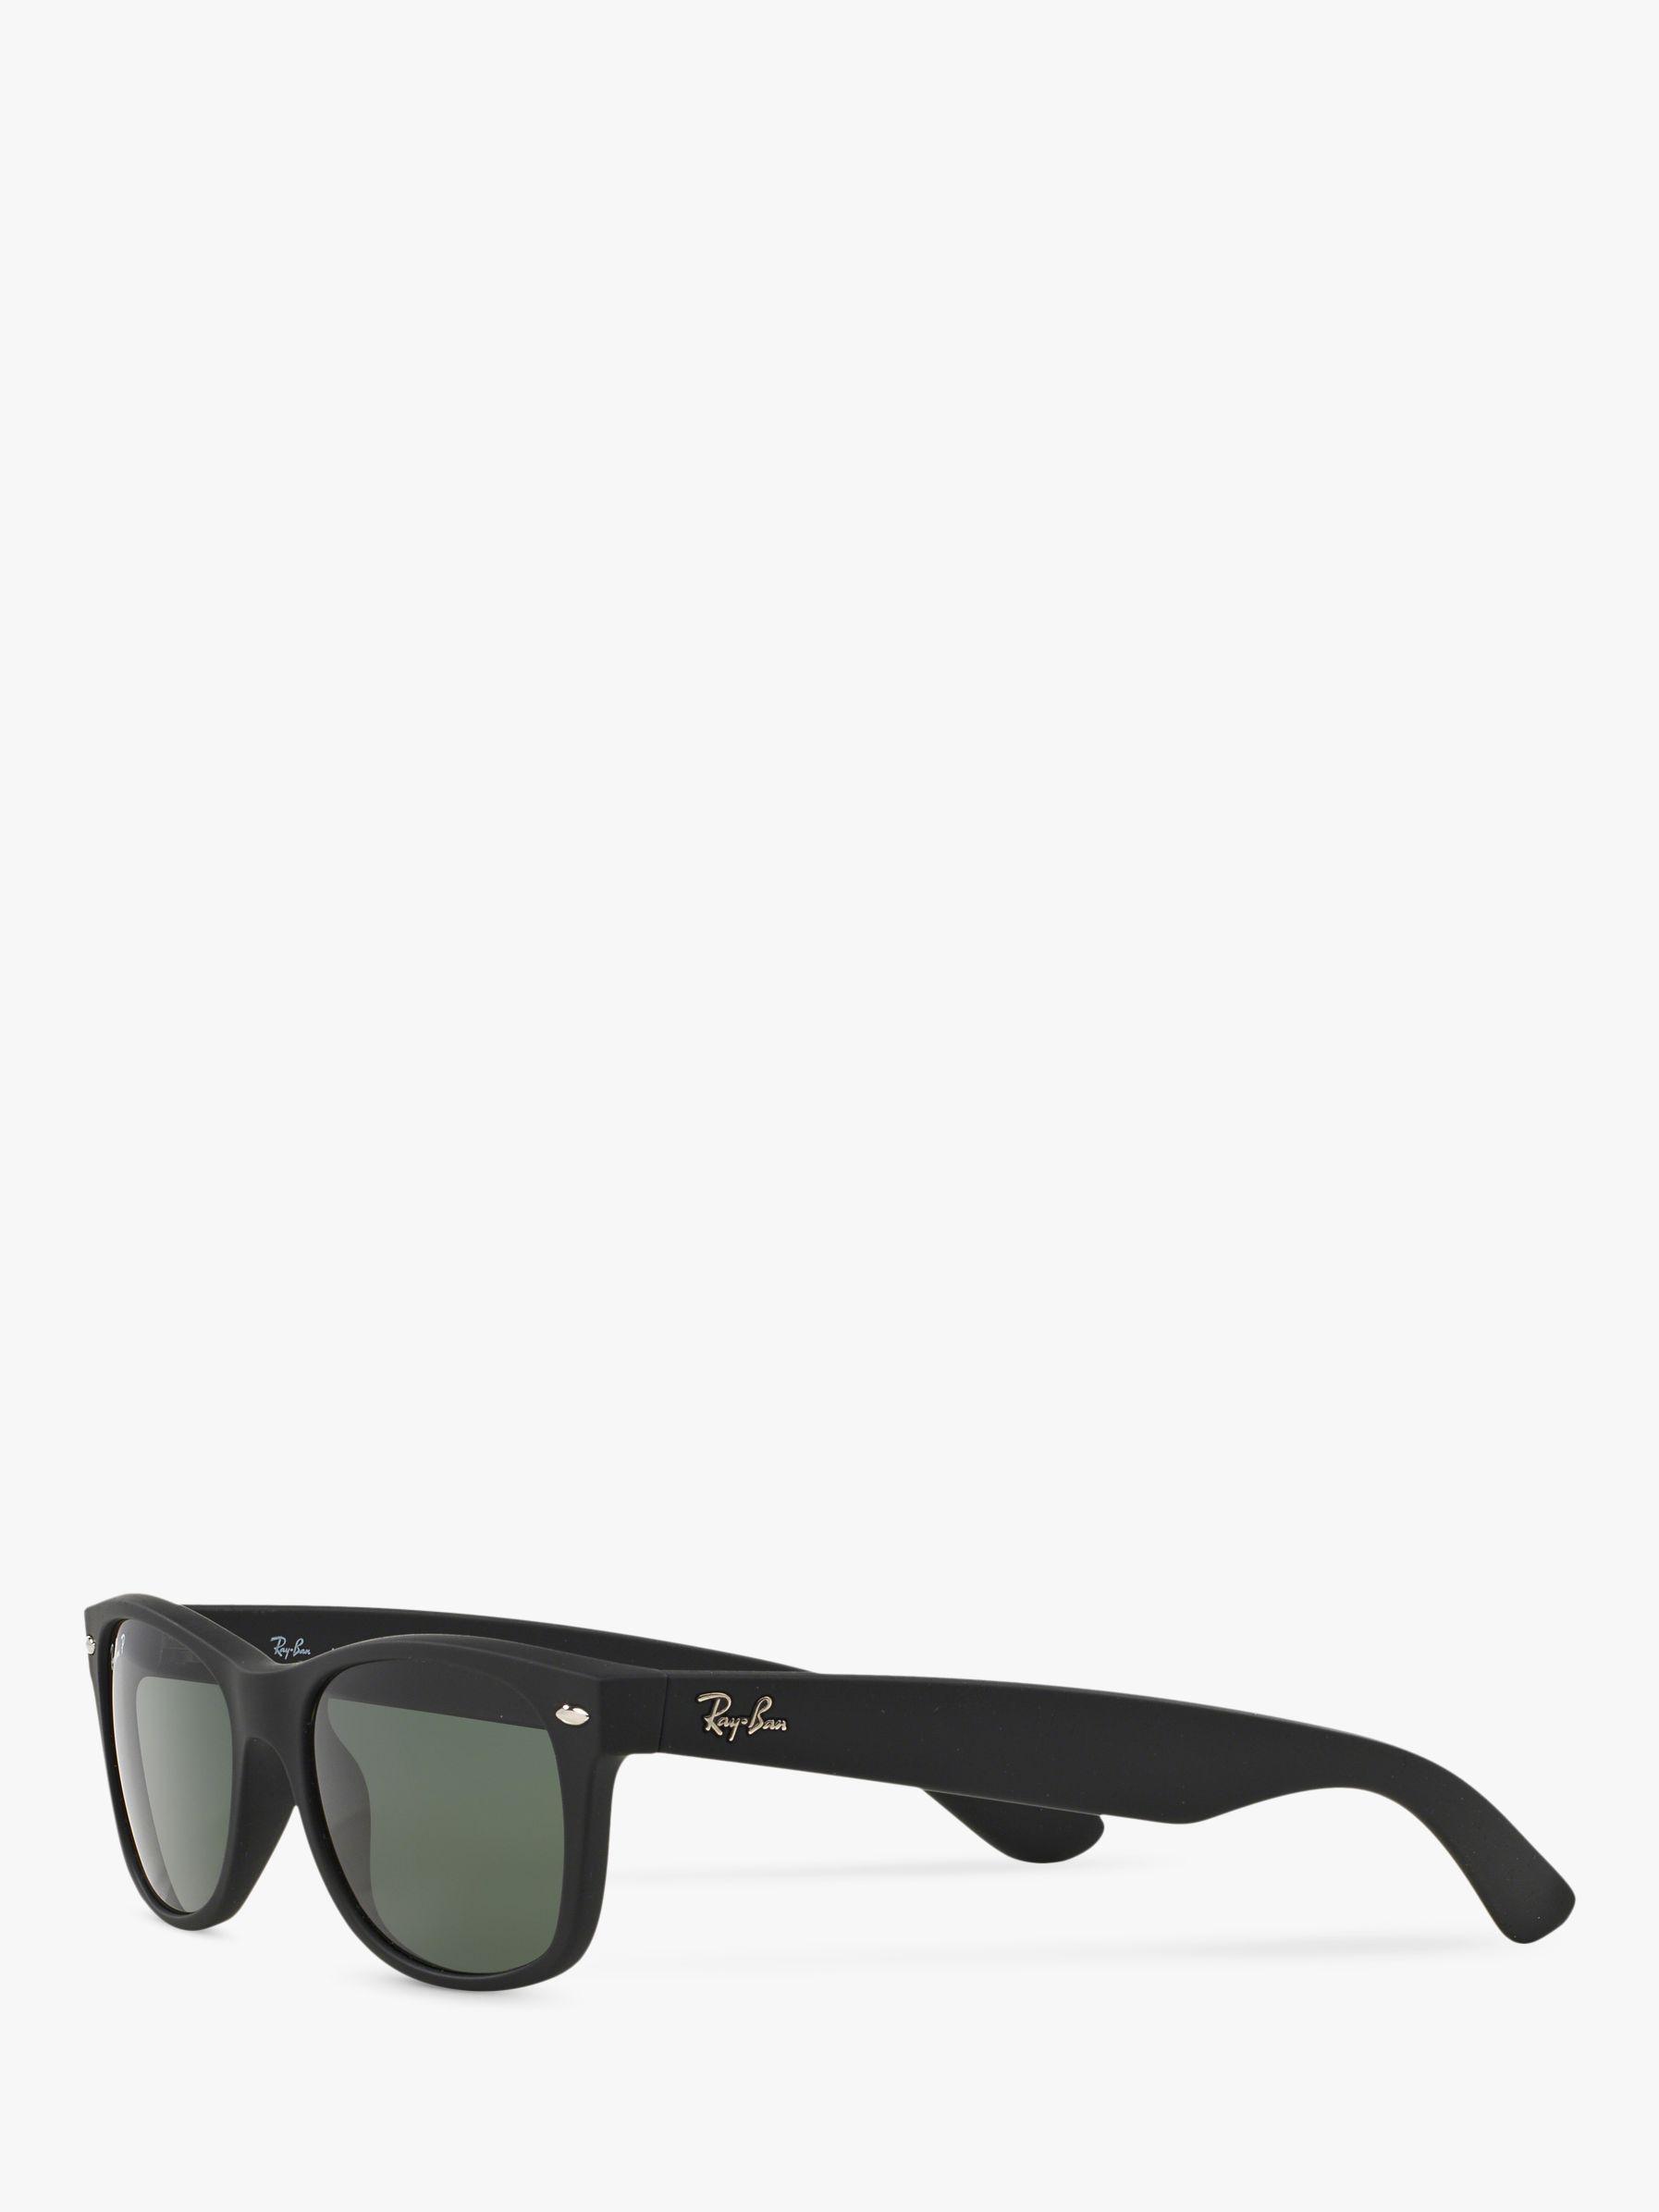 660ac2f3de Ray-Ban Rb2132 Men s New Wayfarer Polarised Sunglasses in Black for Men -  Lyst